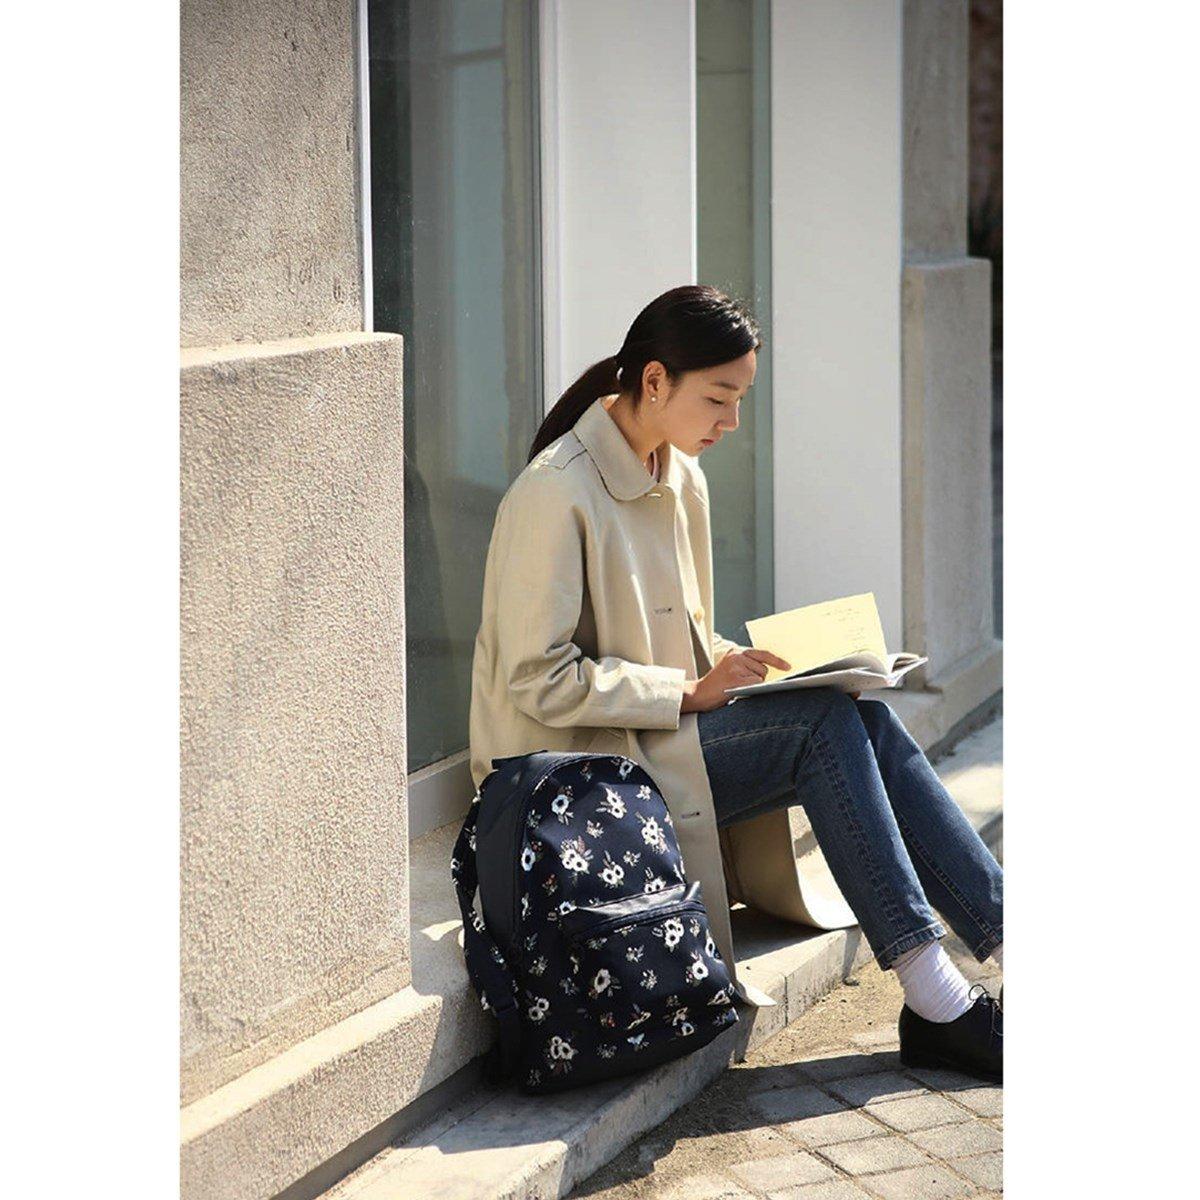 Caveenキャンバスバックパック犬かわいい学校ブックバッグFunny Star Shoulder Bag for Kids /女の子/男の子/ Teenagers B078J6QZYX Flamingos Dark Blue